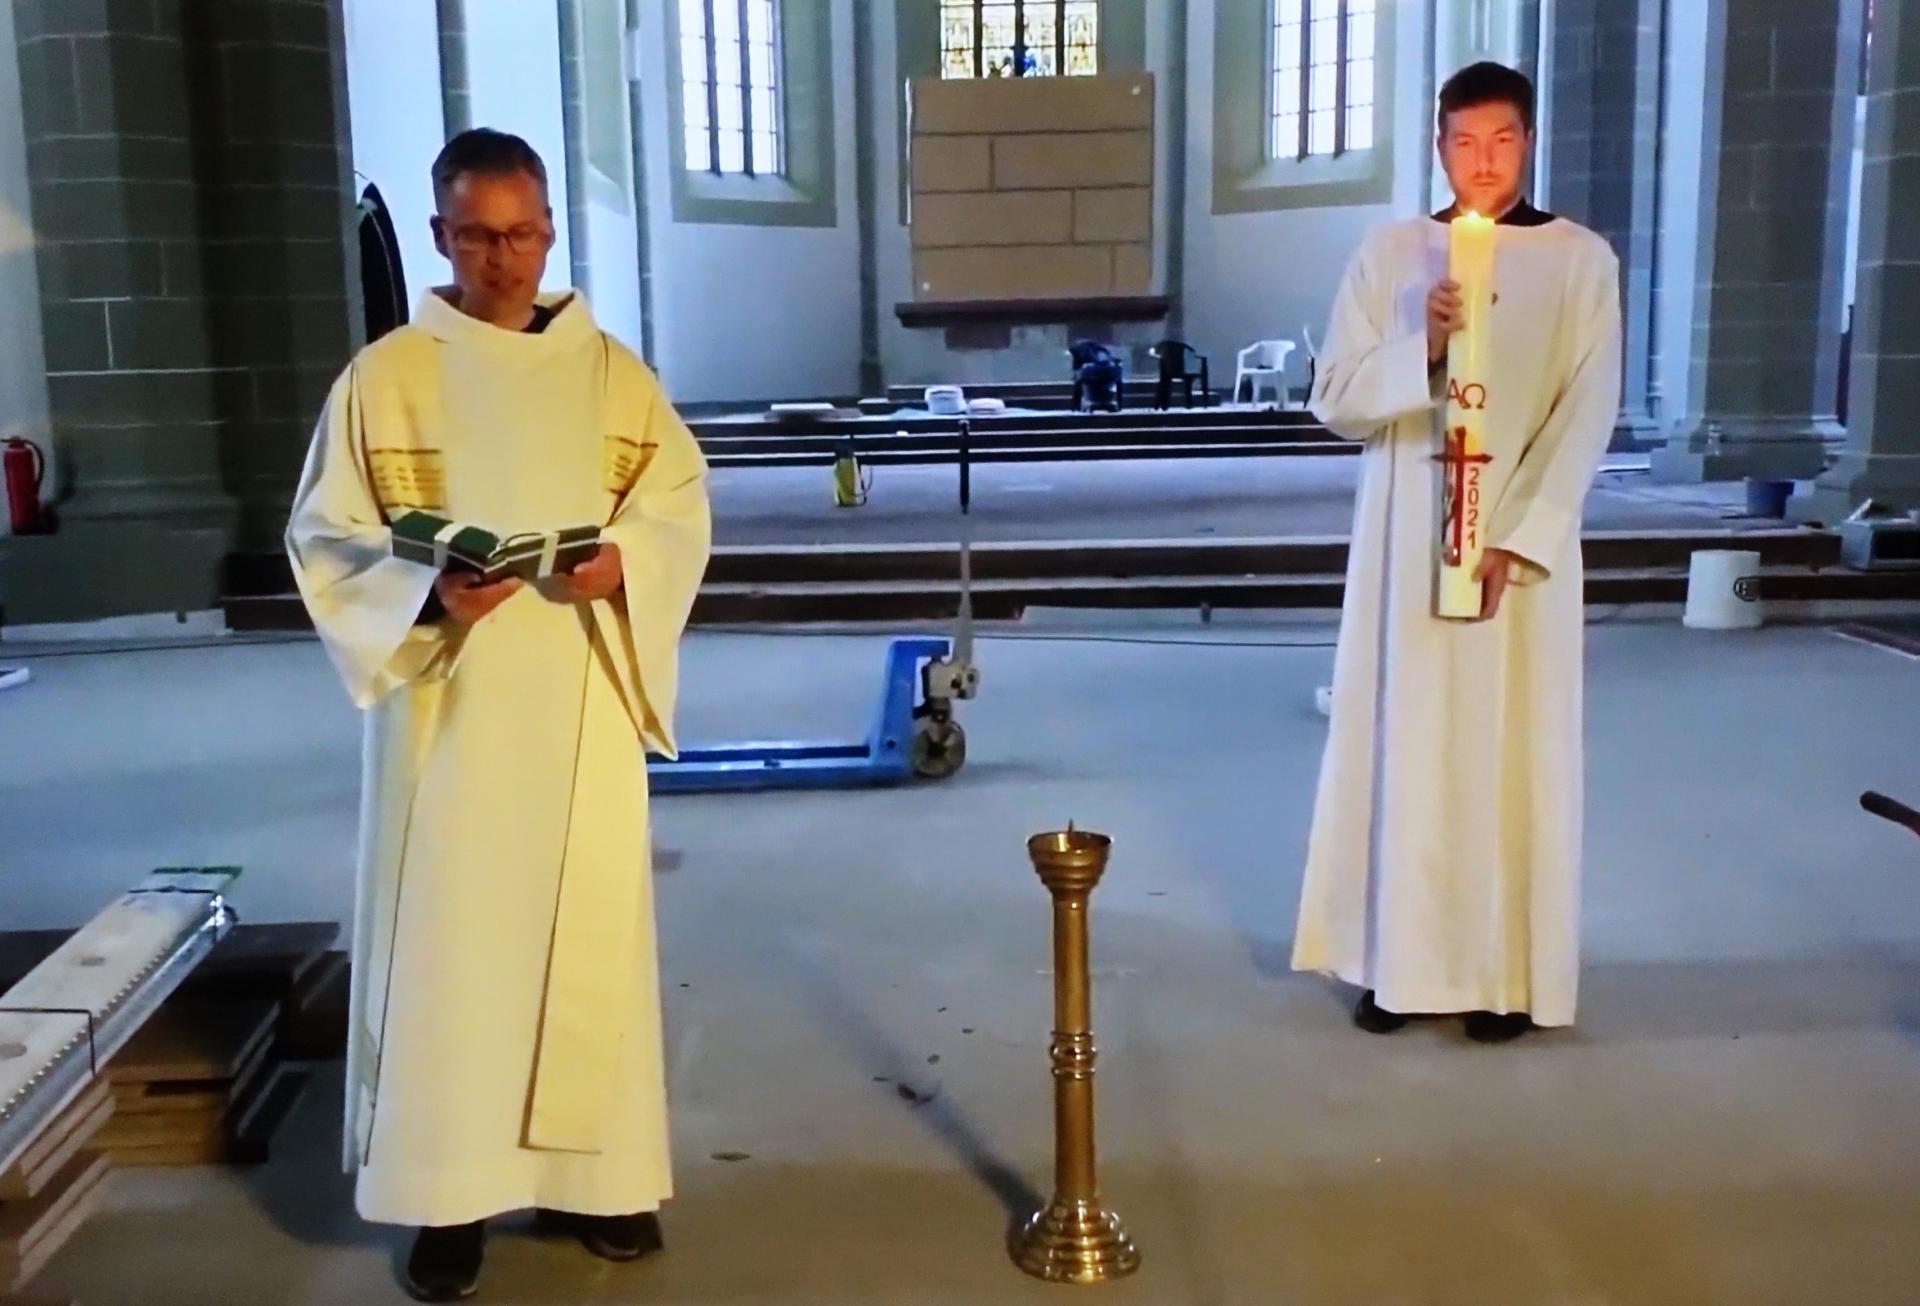 Andacht mit Pastor Stefan Leonhardt und osterkerzenhaltender Kantor Benjamin Dippel.